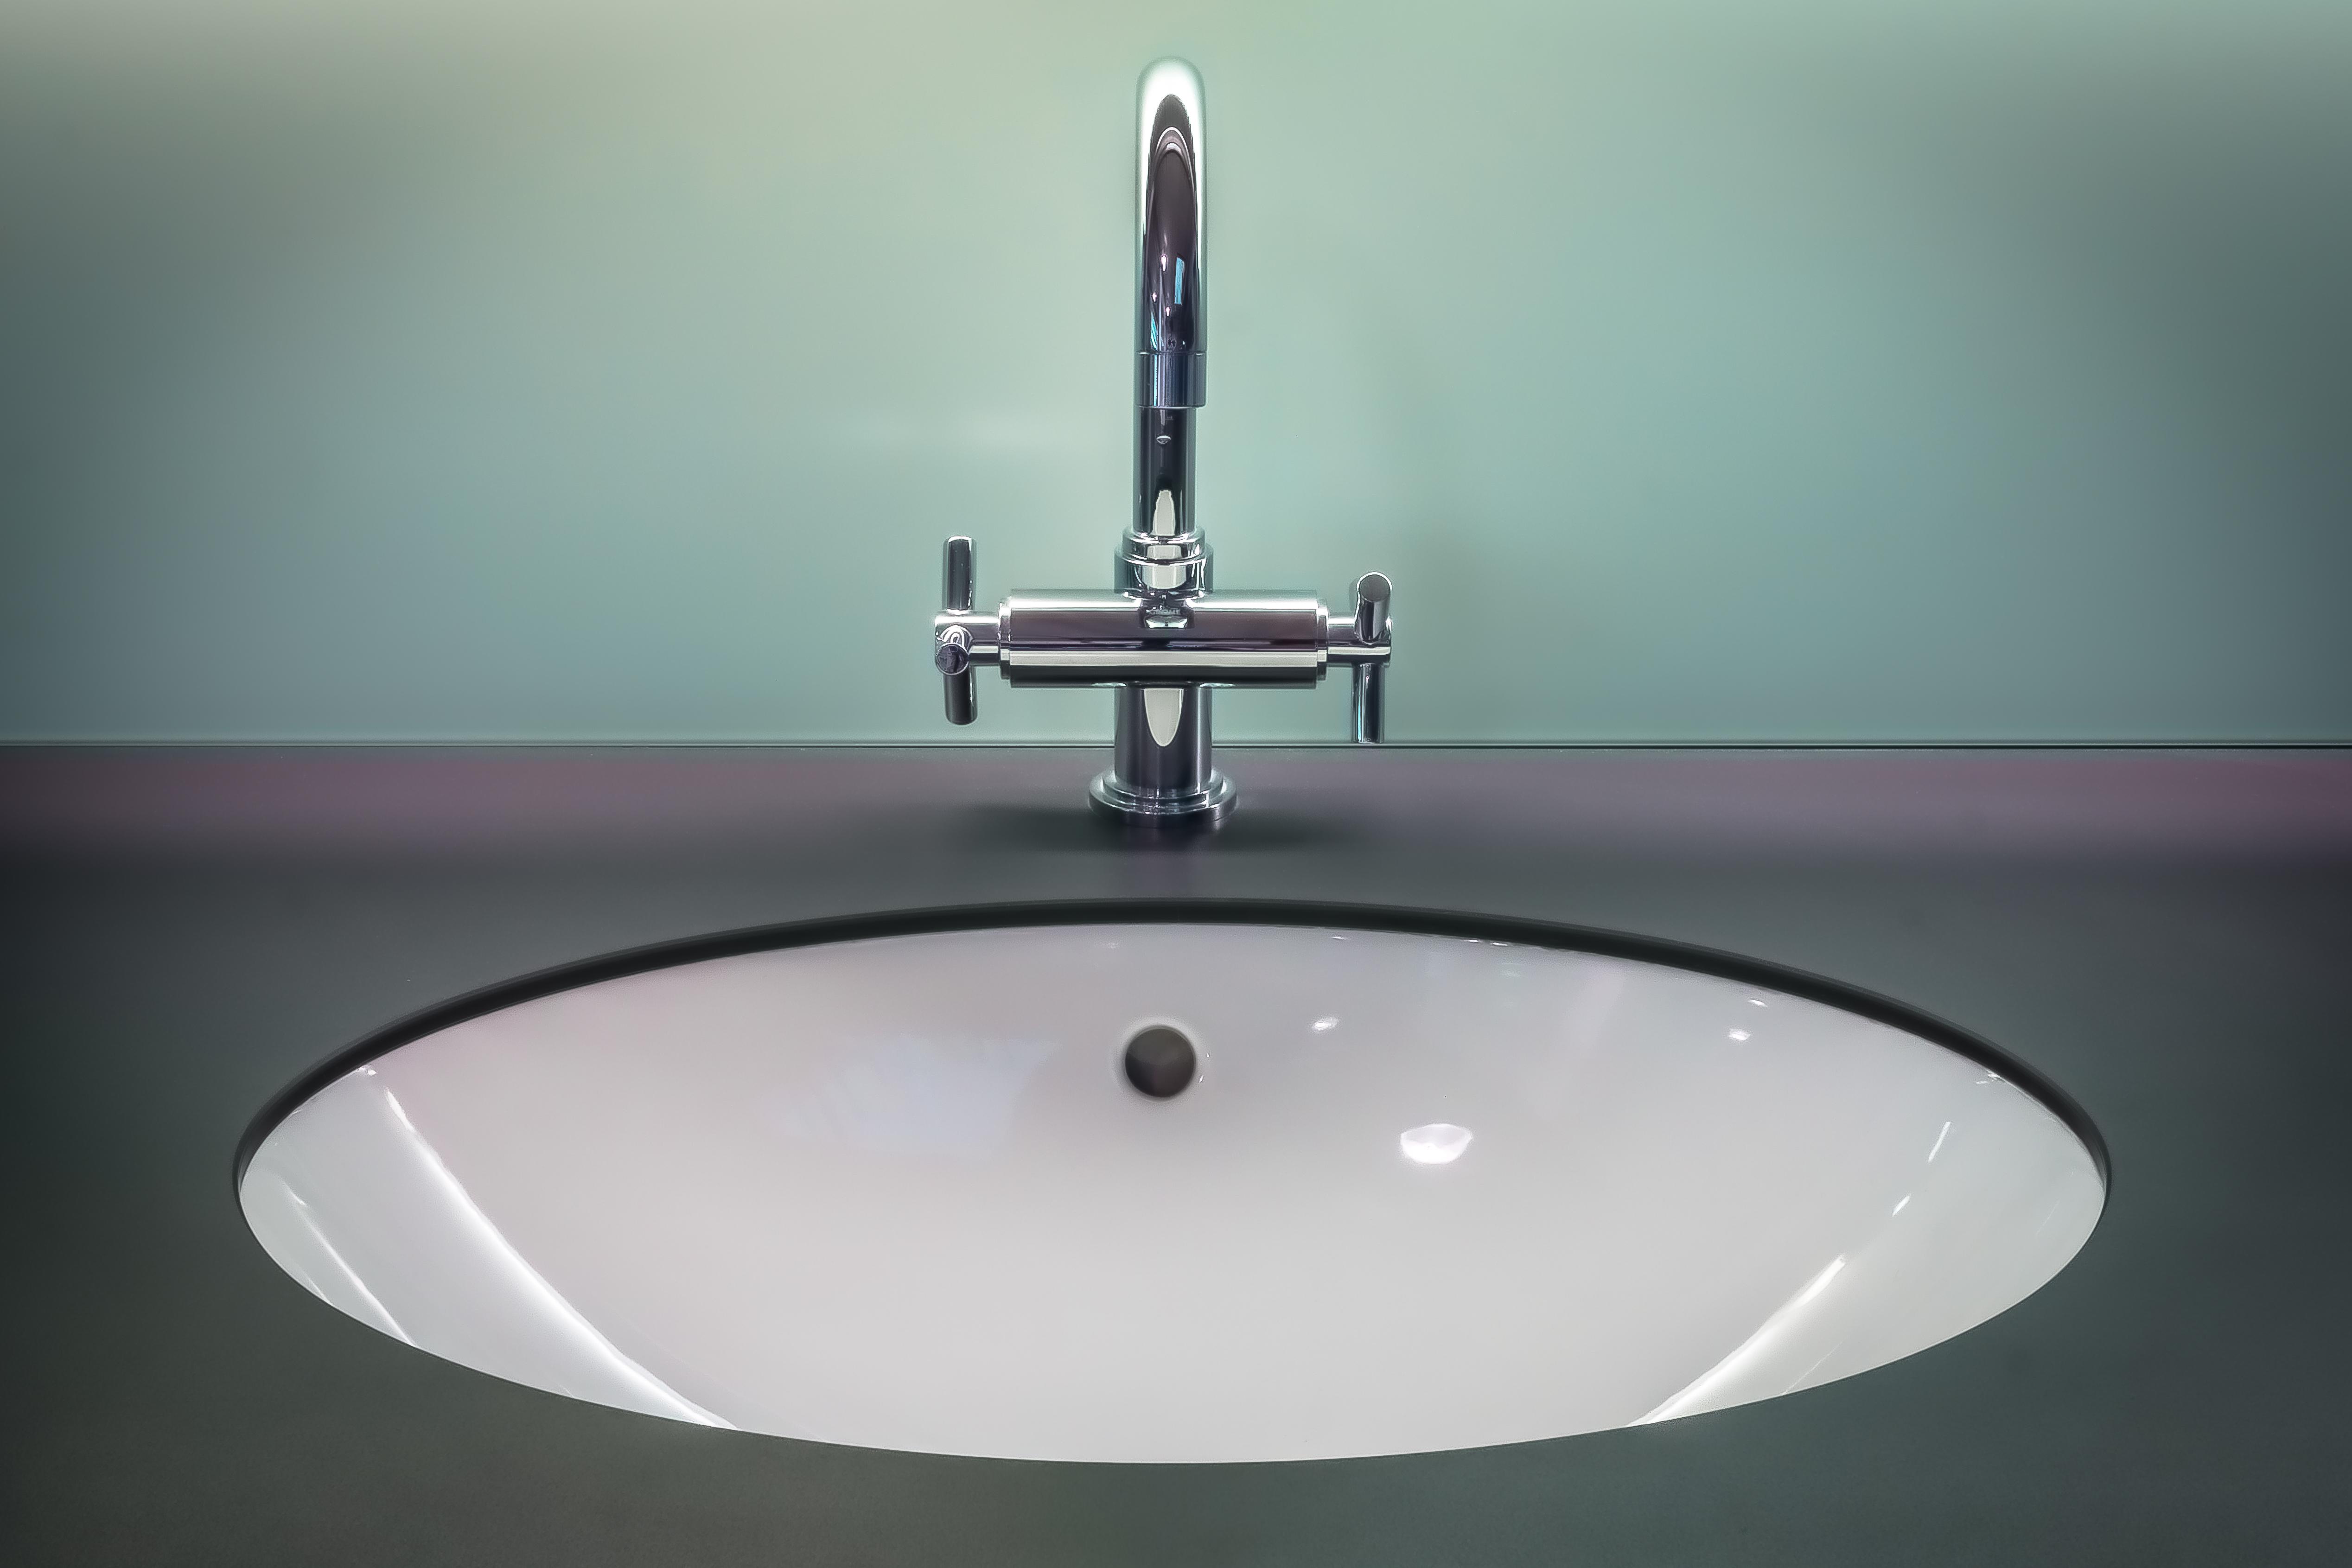 Free Images : clean, sink, room, lighting, modern, stainless steel ...